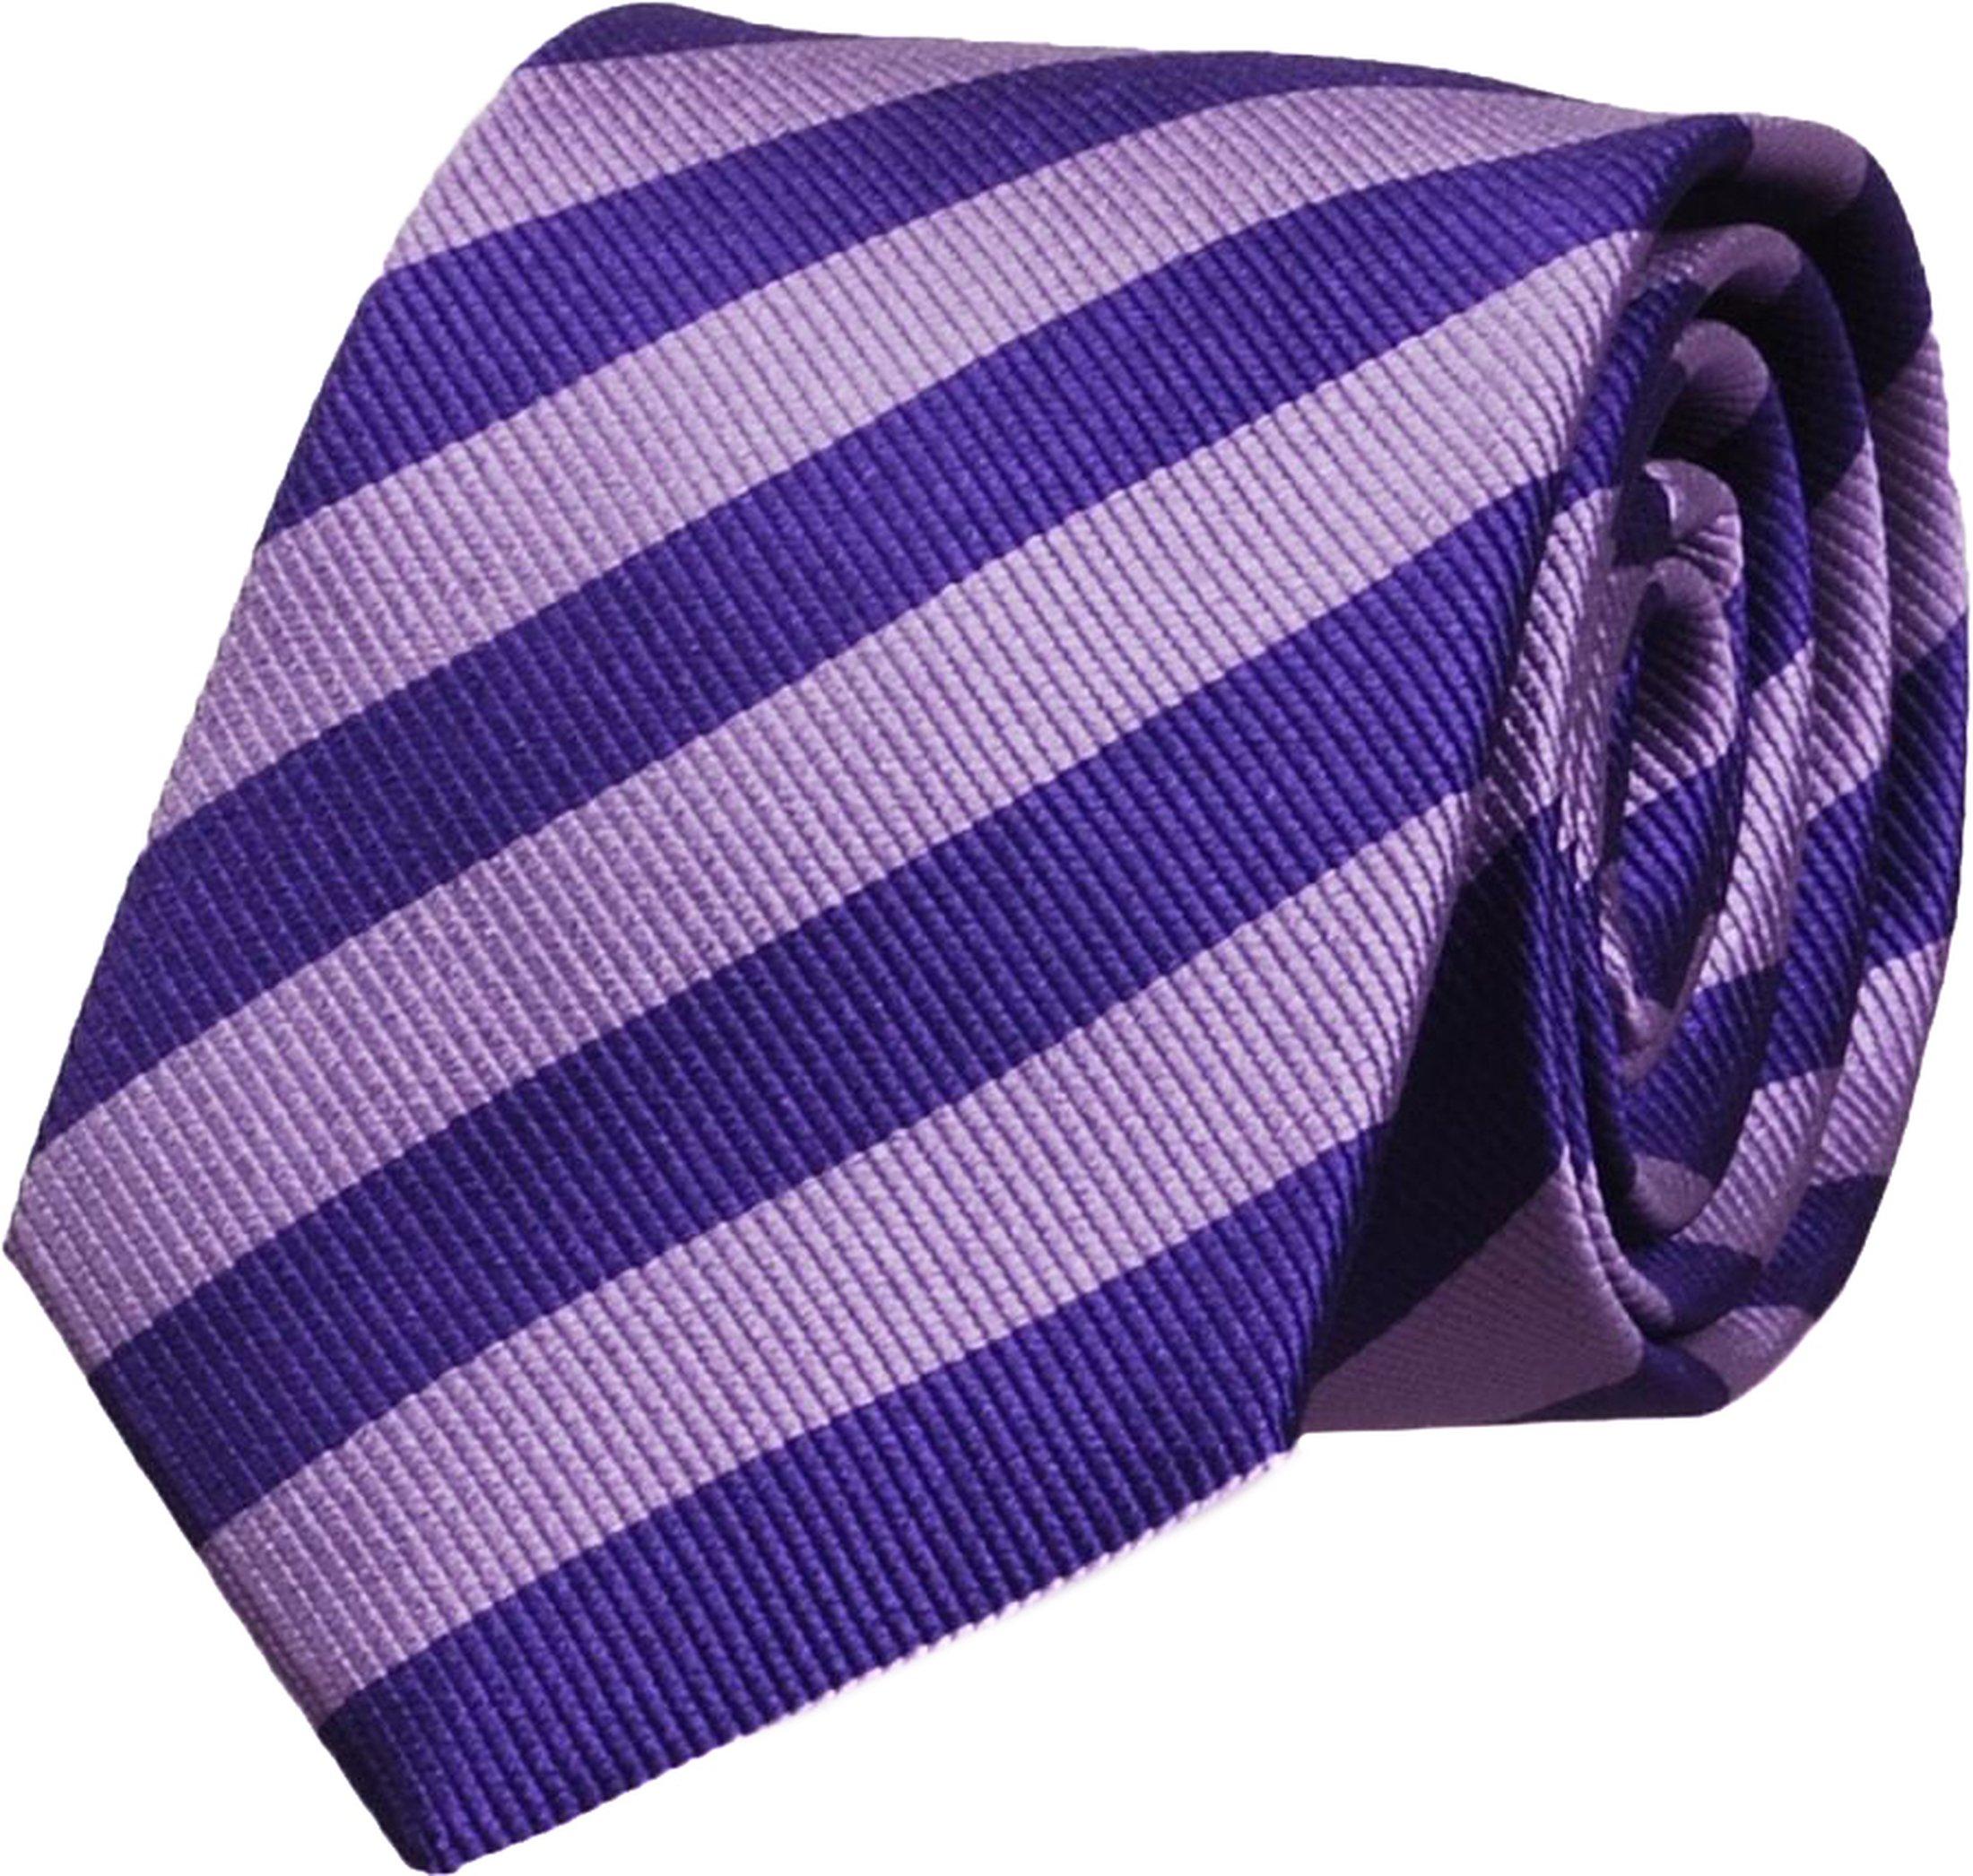 Silk Tie Lime Lila + Deep Purple Striped FD04